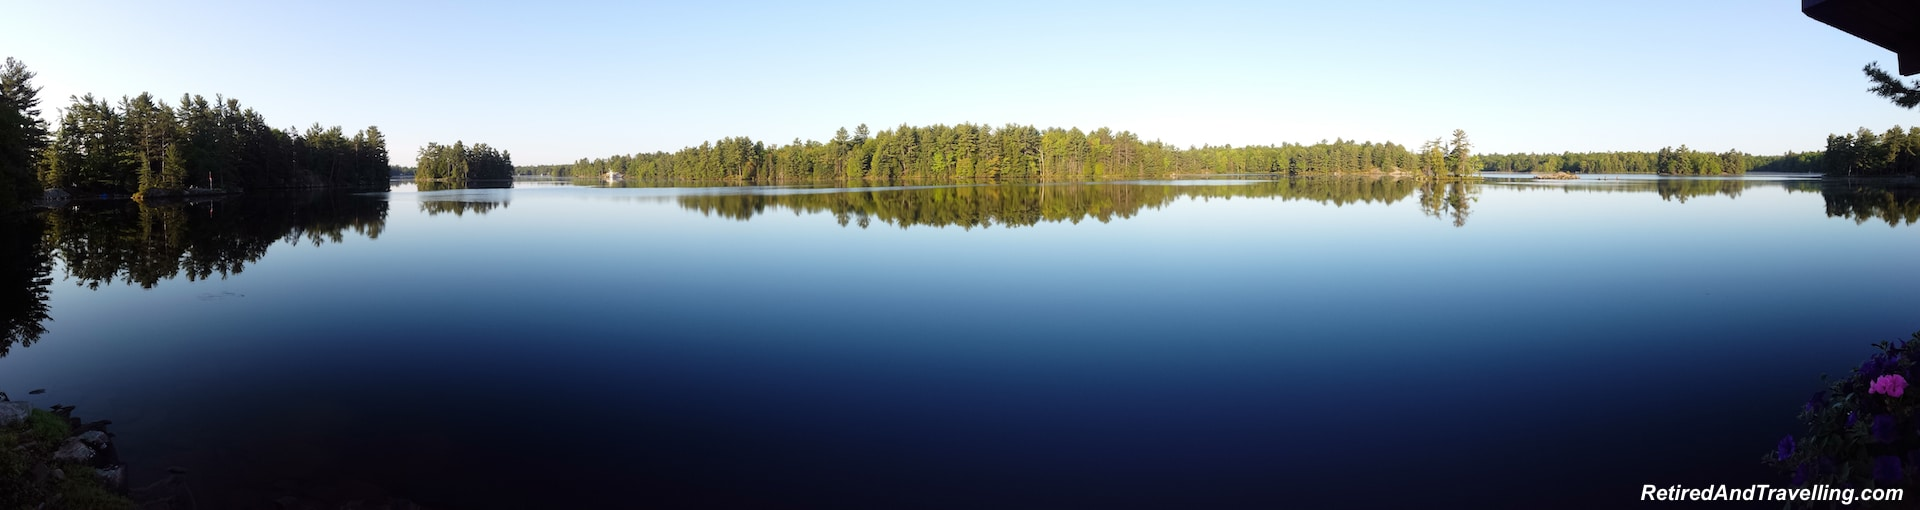 Calm Lake - Toronto Cottage Country.jpg